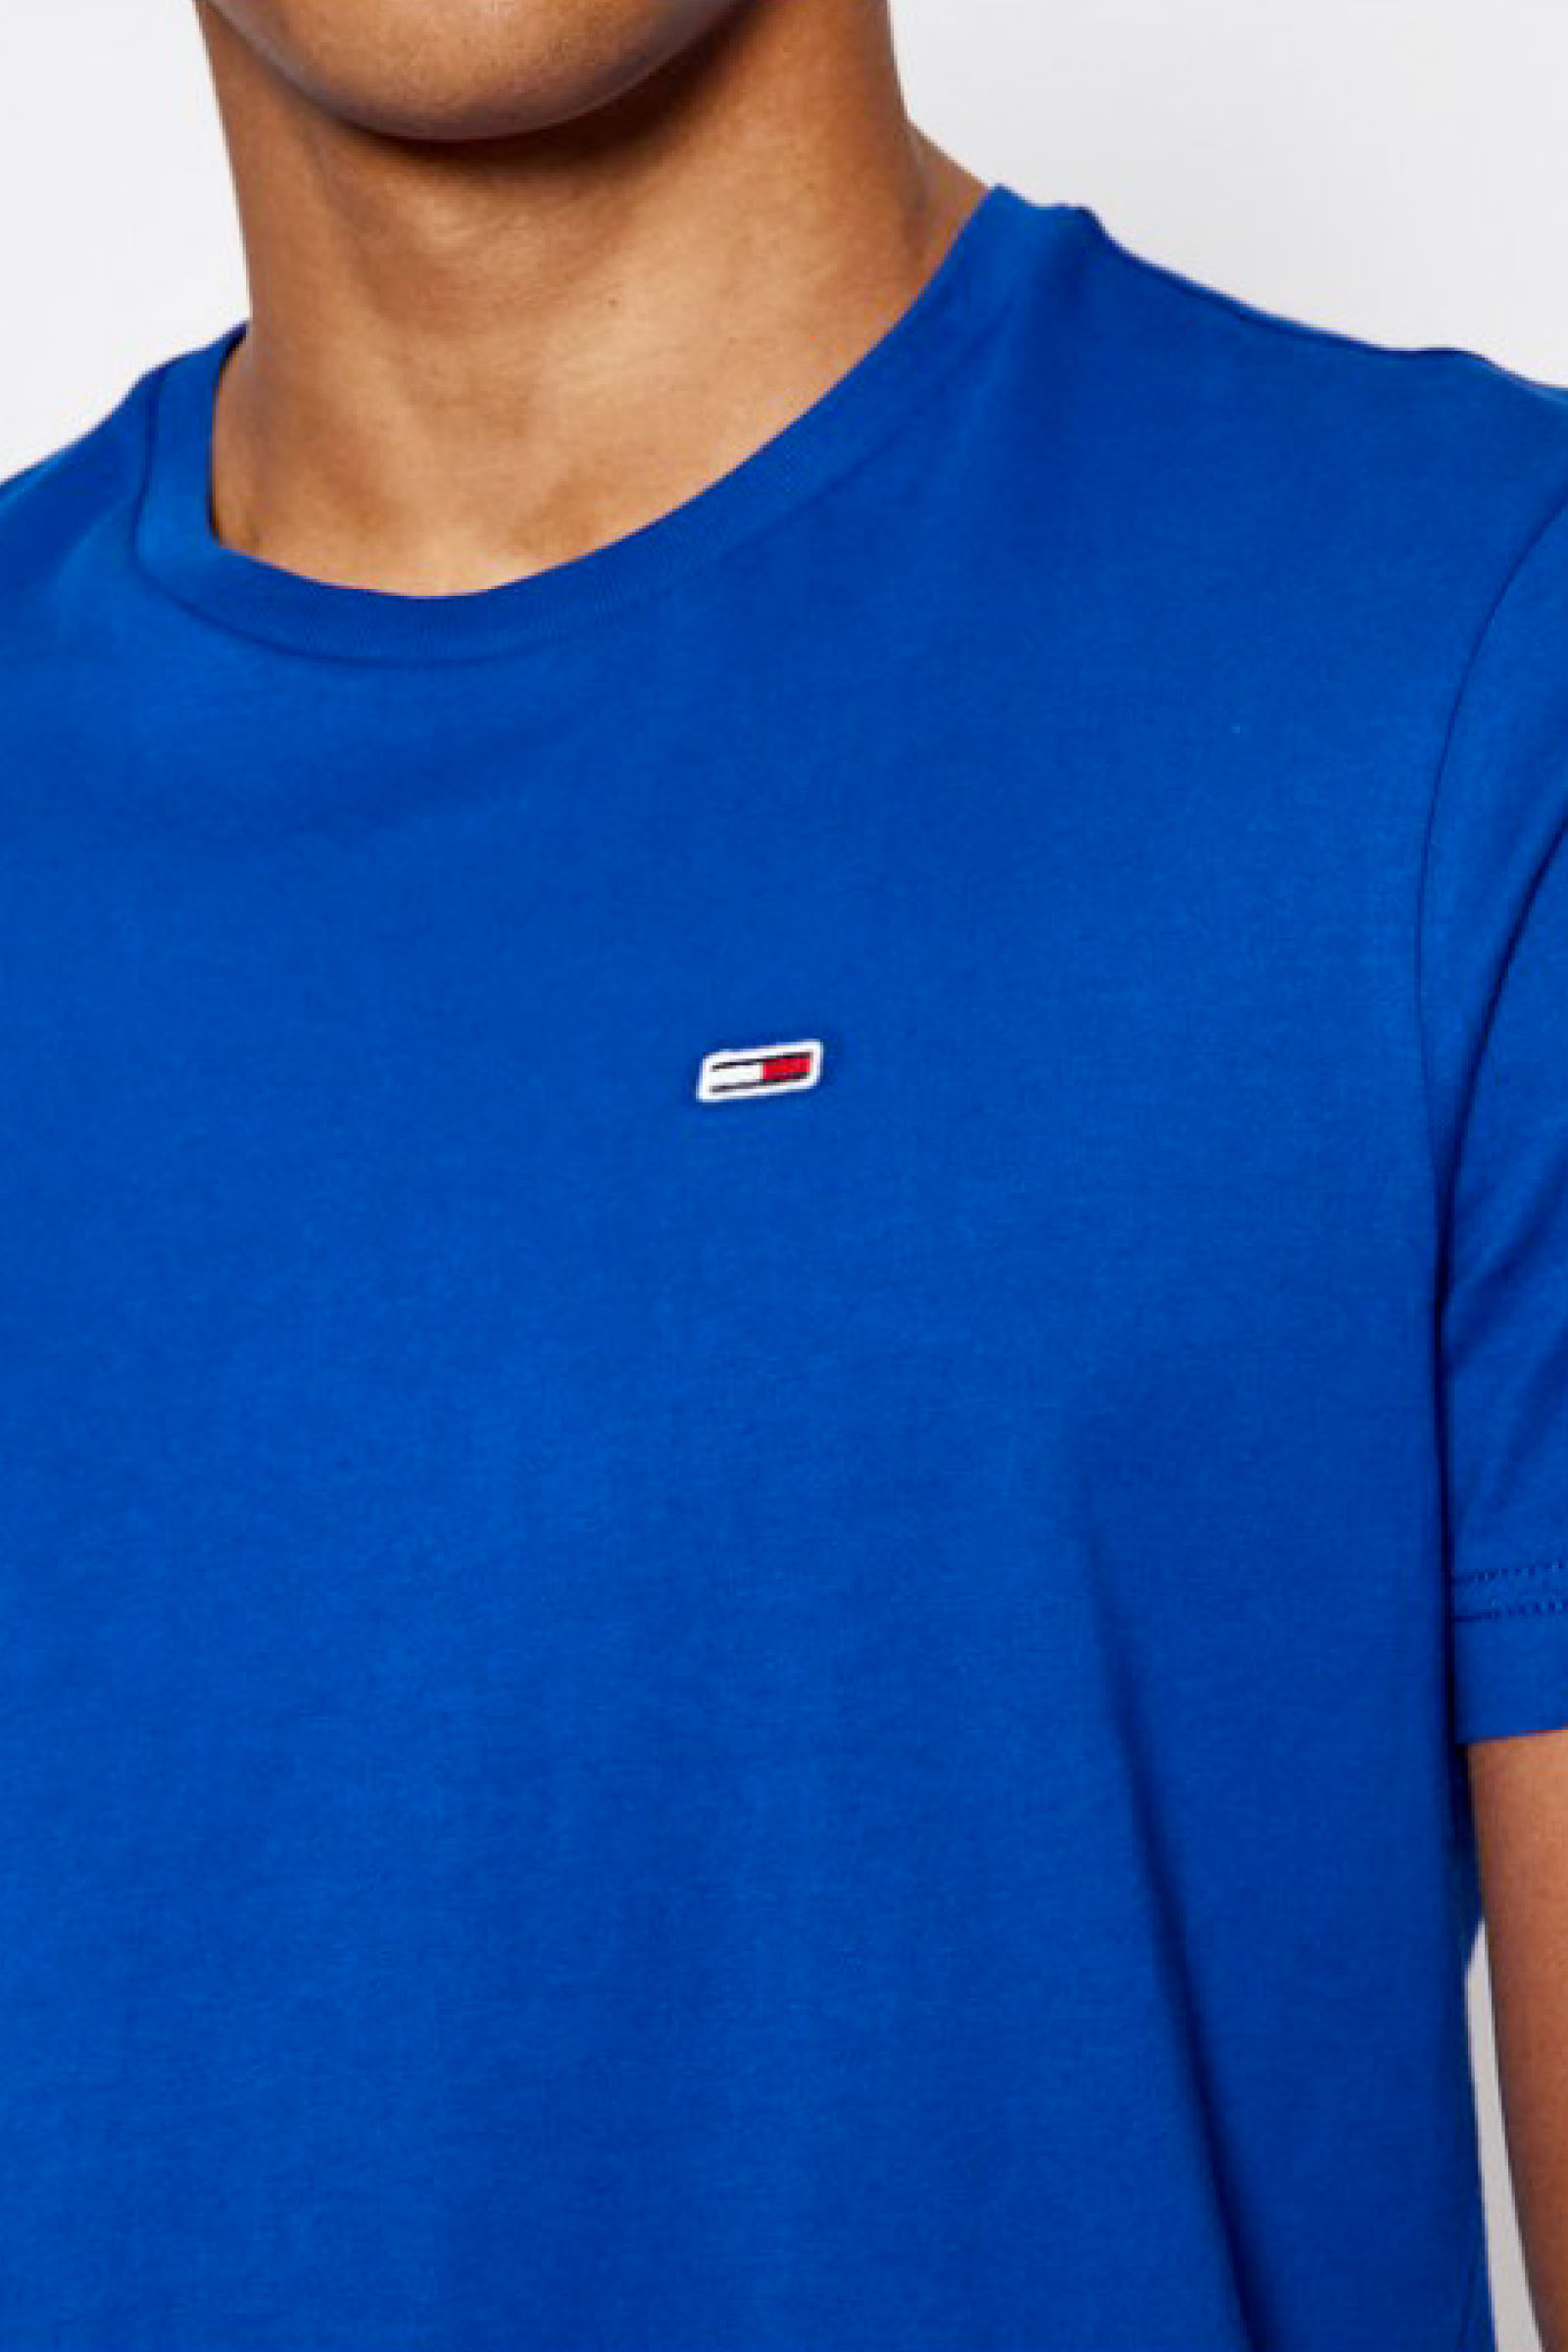 TOMMY JEANS T-Shirt Uomo TOMMY JEANS | T-Shirt | DM0DM10101C65